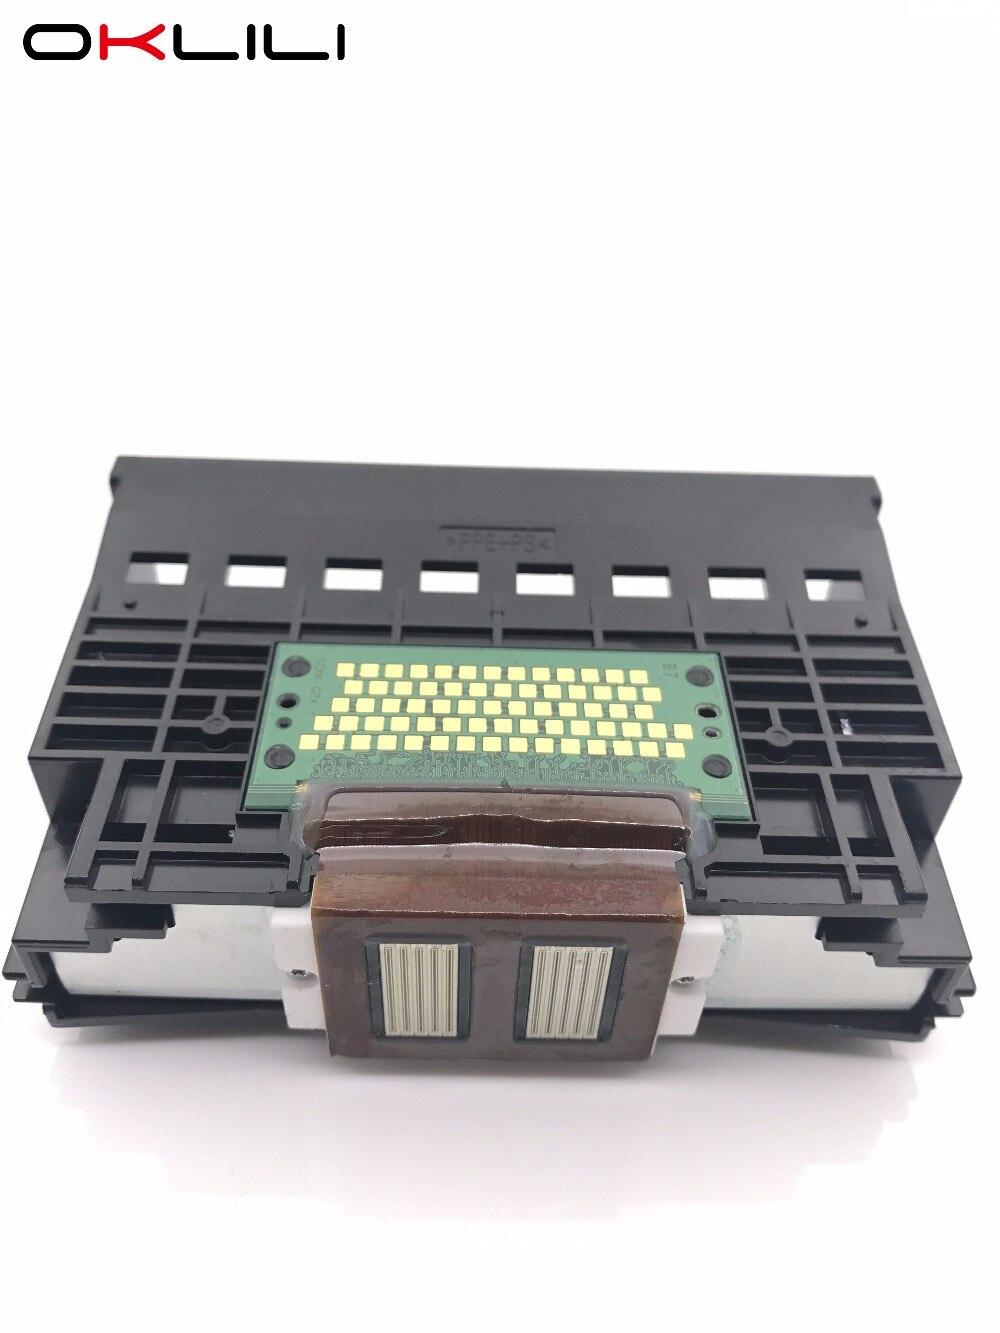 OKLILI QY6-0076 Printhead Print Head Printer Head for Canon PIXUS 9900i i9900 i9950 iP8600 iP8500 iP9910 Pro9000 Mark II 0076 16b